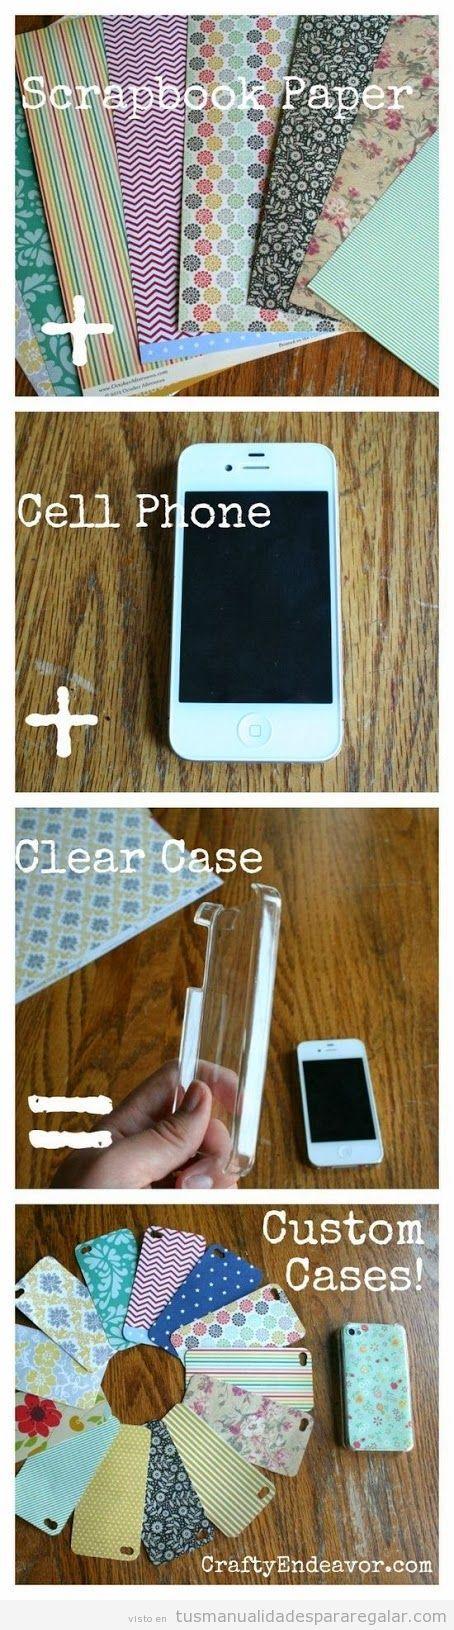 Tutorial para personalizar carcasas móvl